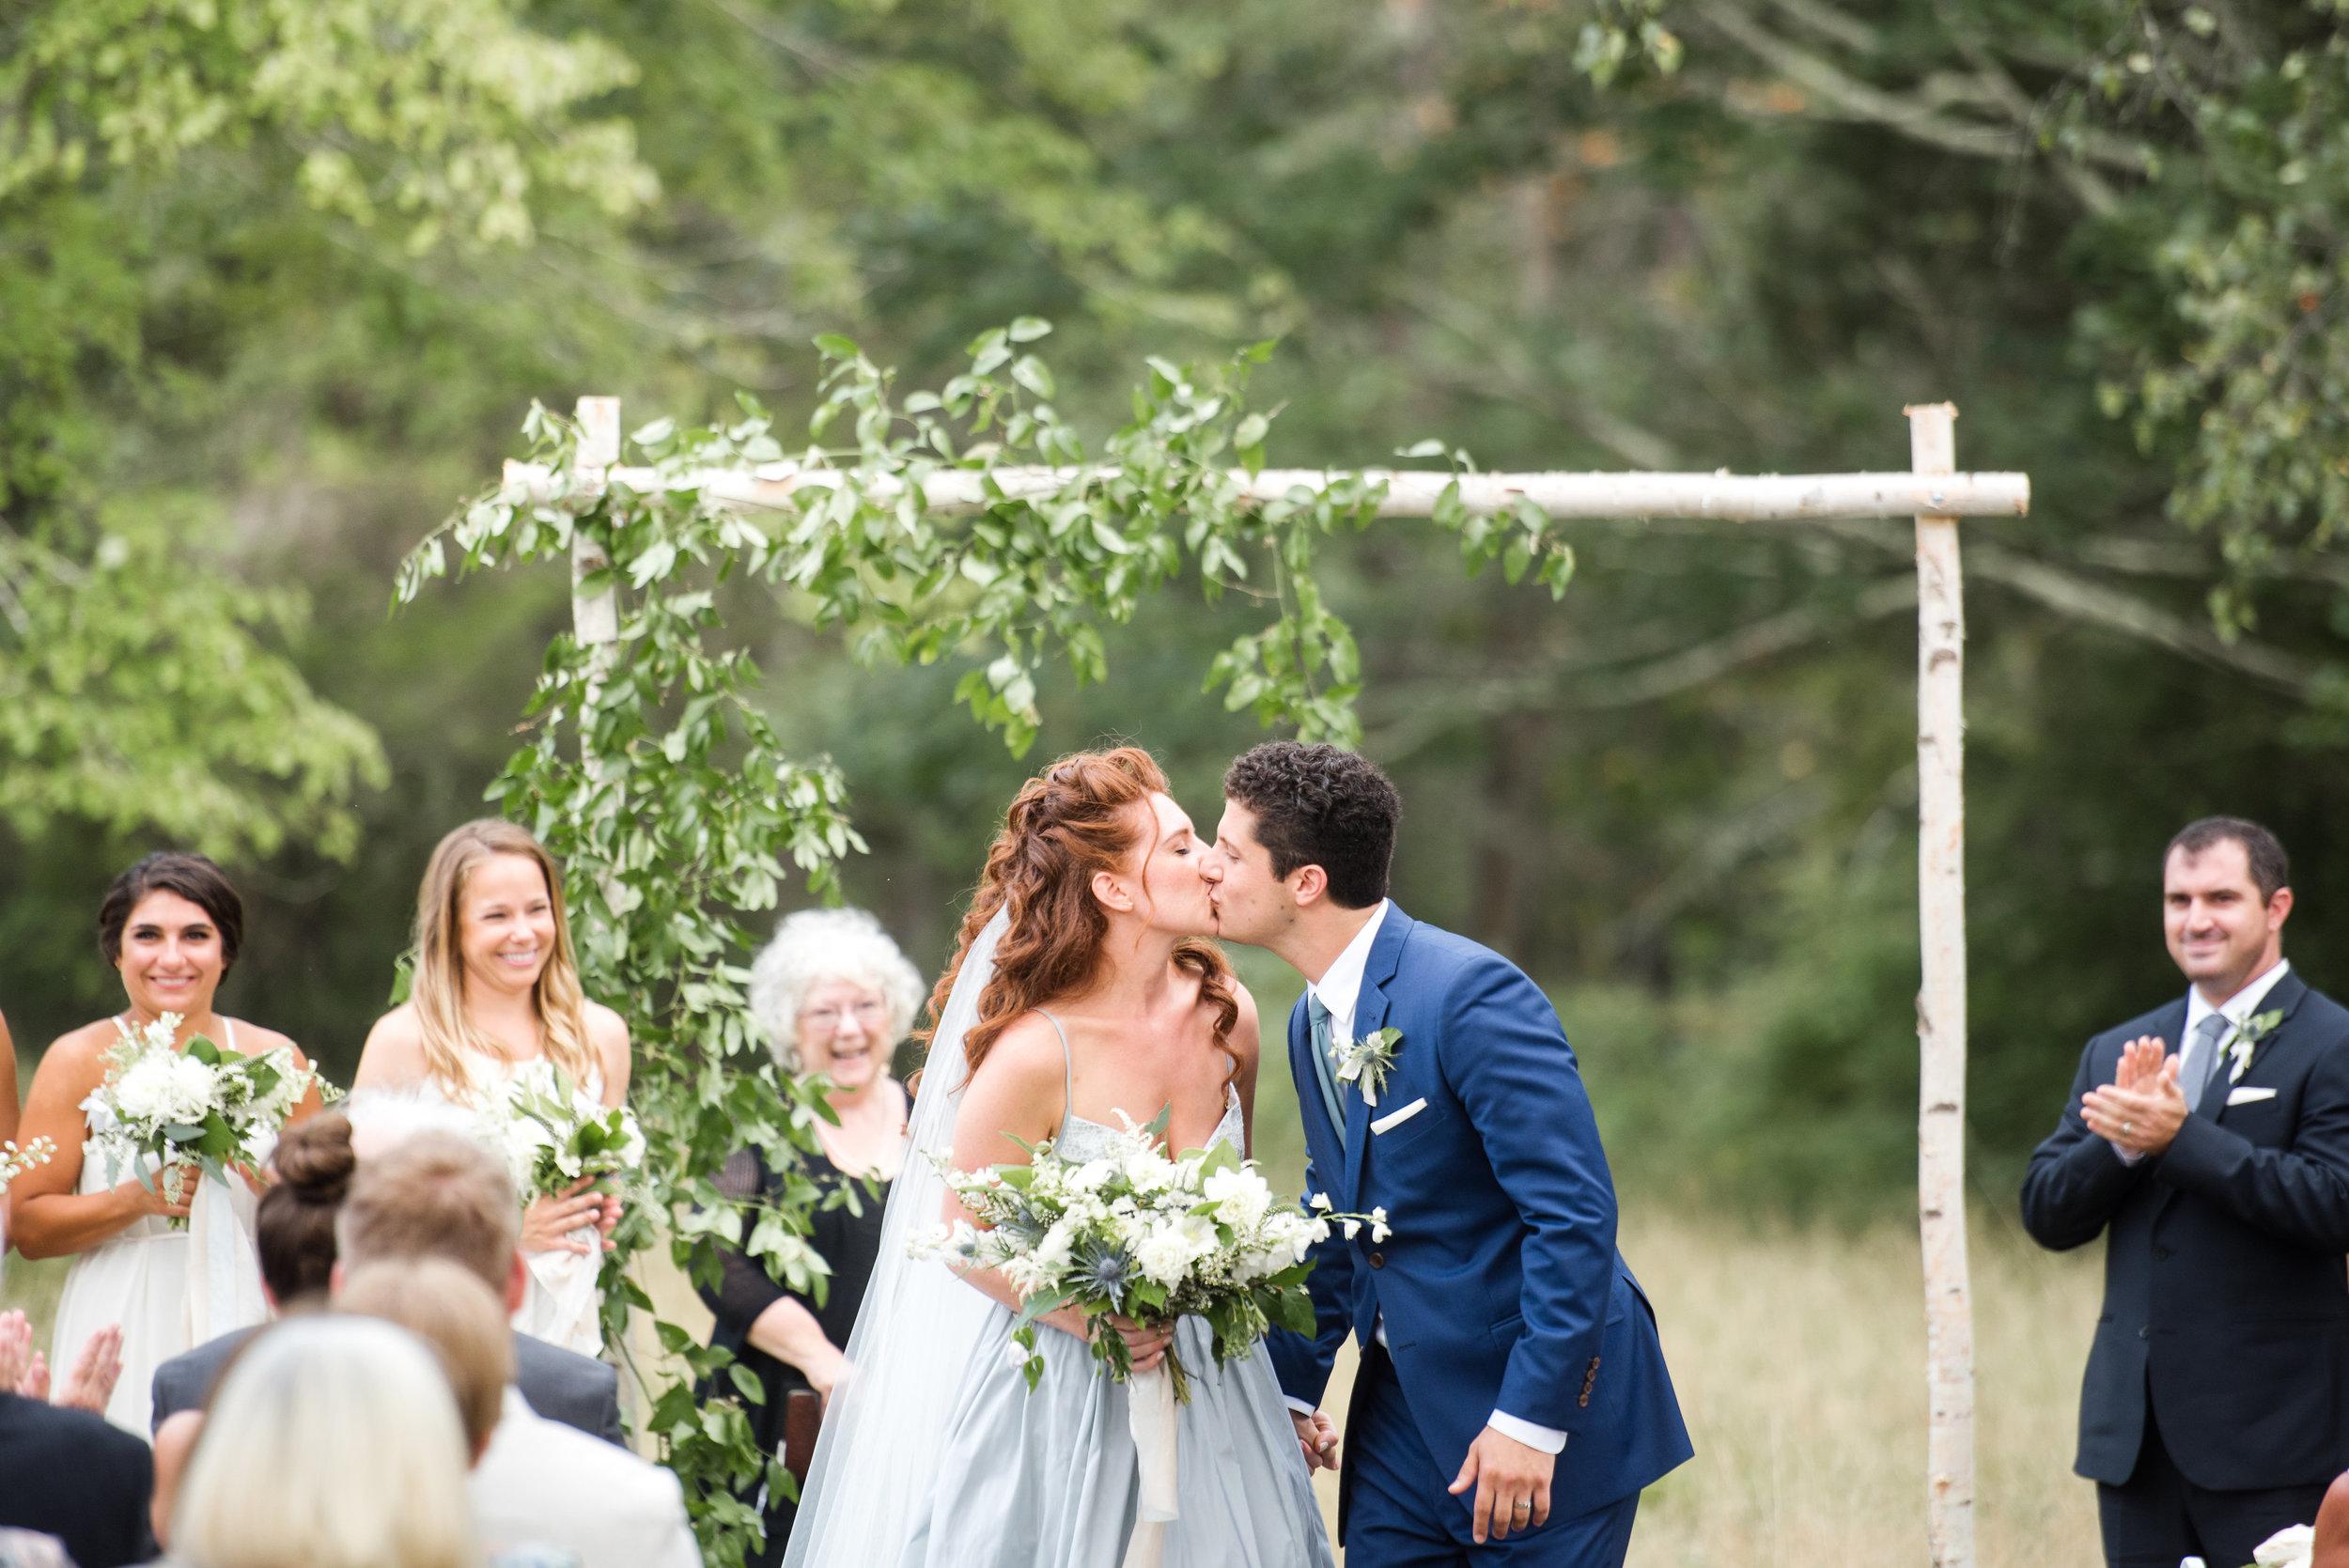 COPPER GEOMETRIC WEDDING LACE FACTORY WEDDING_013.jpg